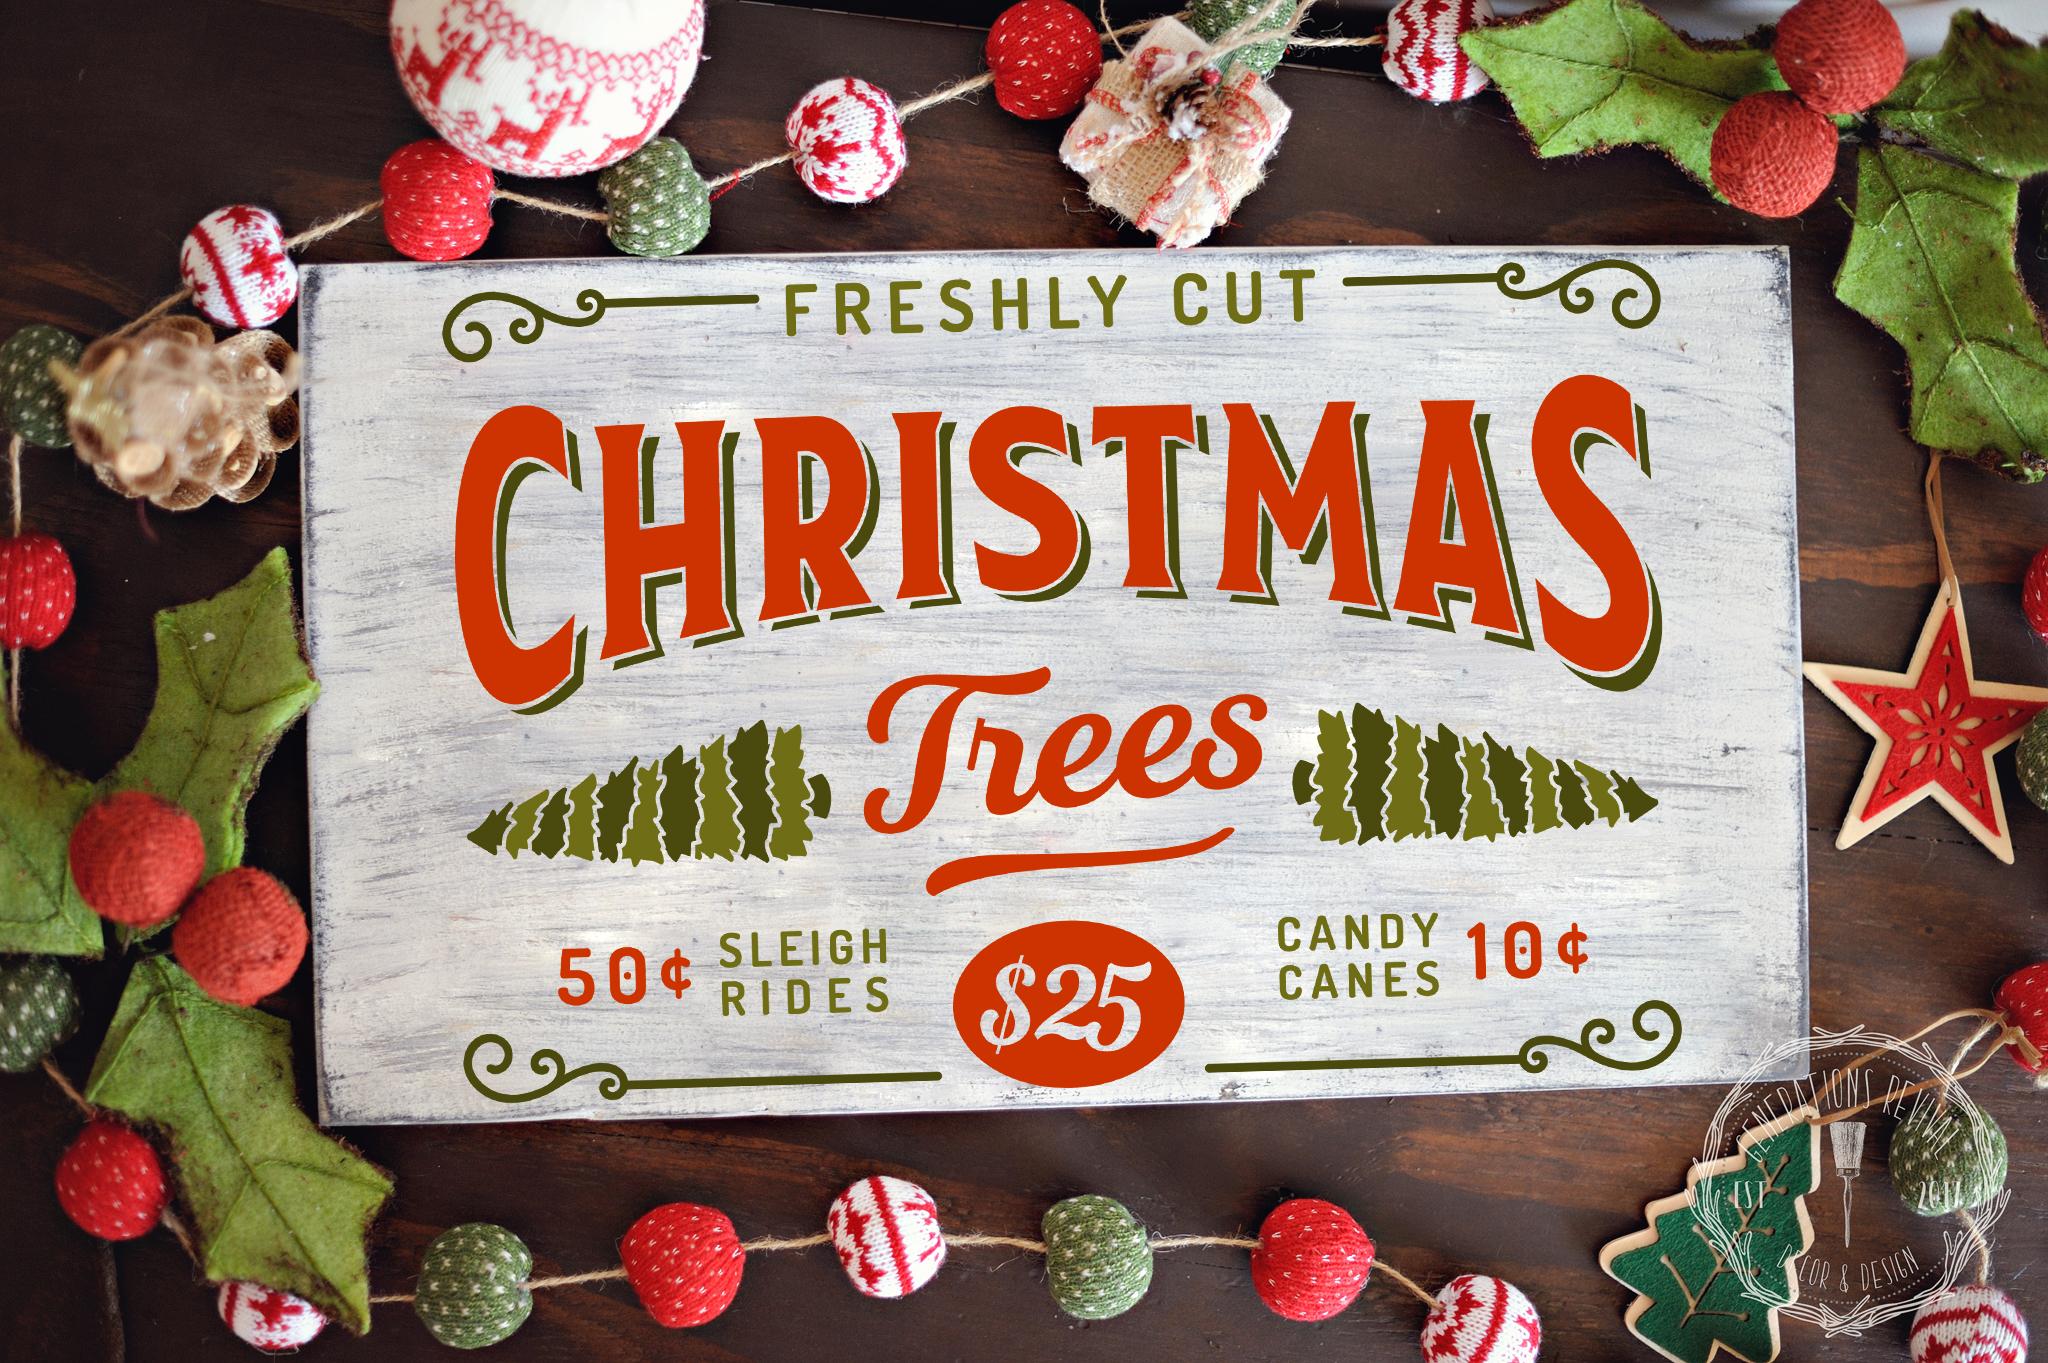 Freshly Cut Christmas Trees.jpg